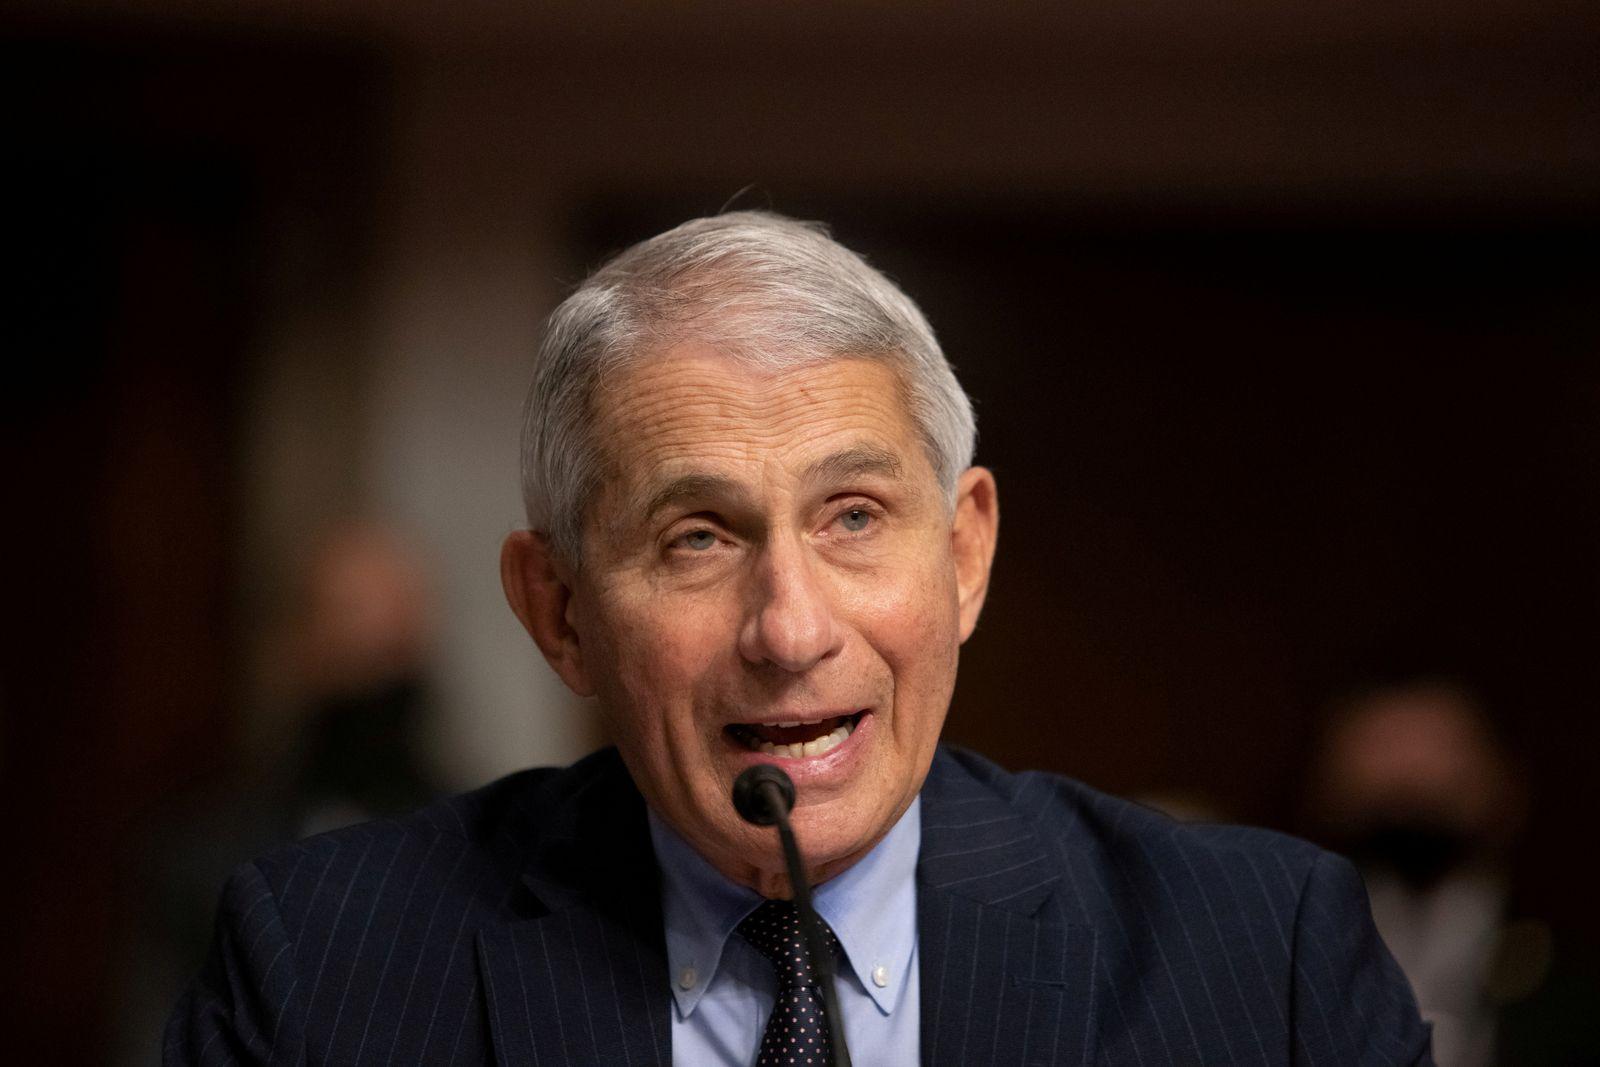 FILE PHOTO: Fauci, Redfield testify at U.S. Senate hearing on coronavirus response in Washington